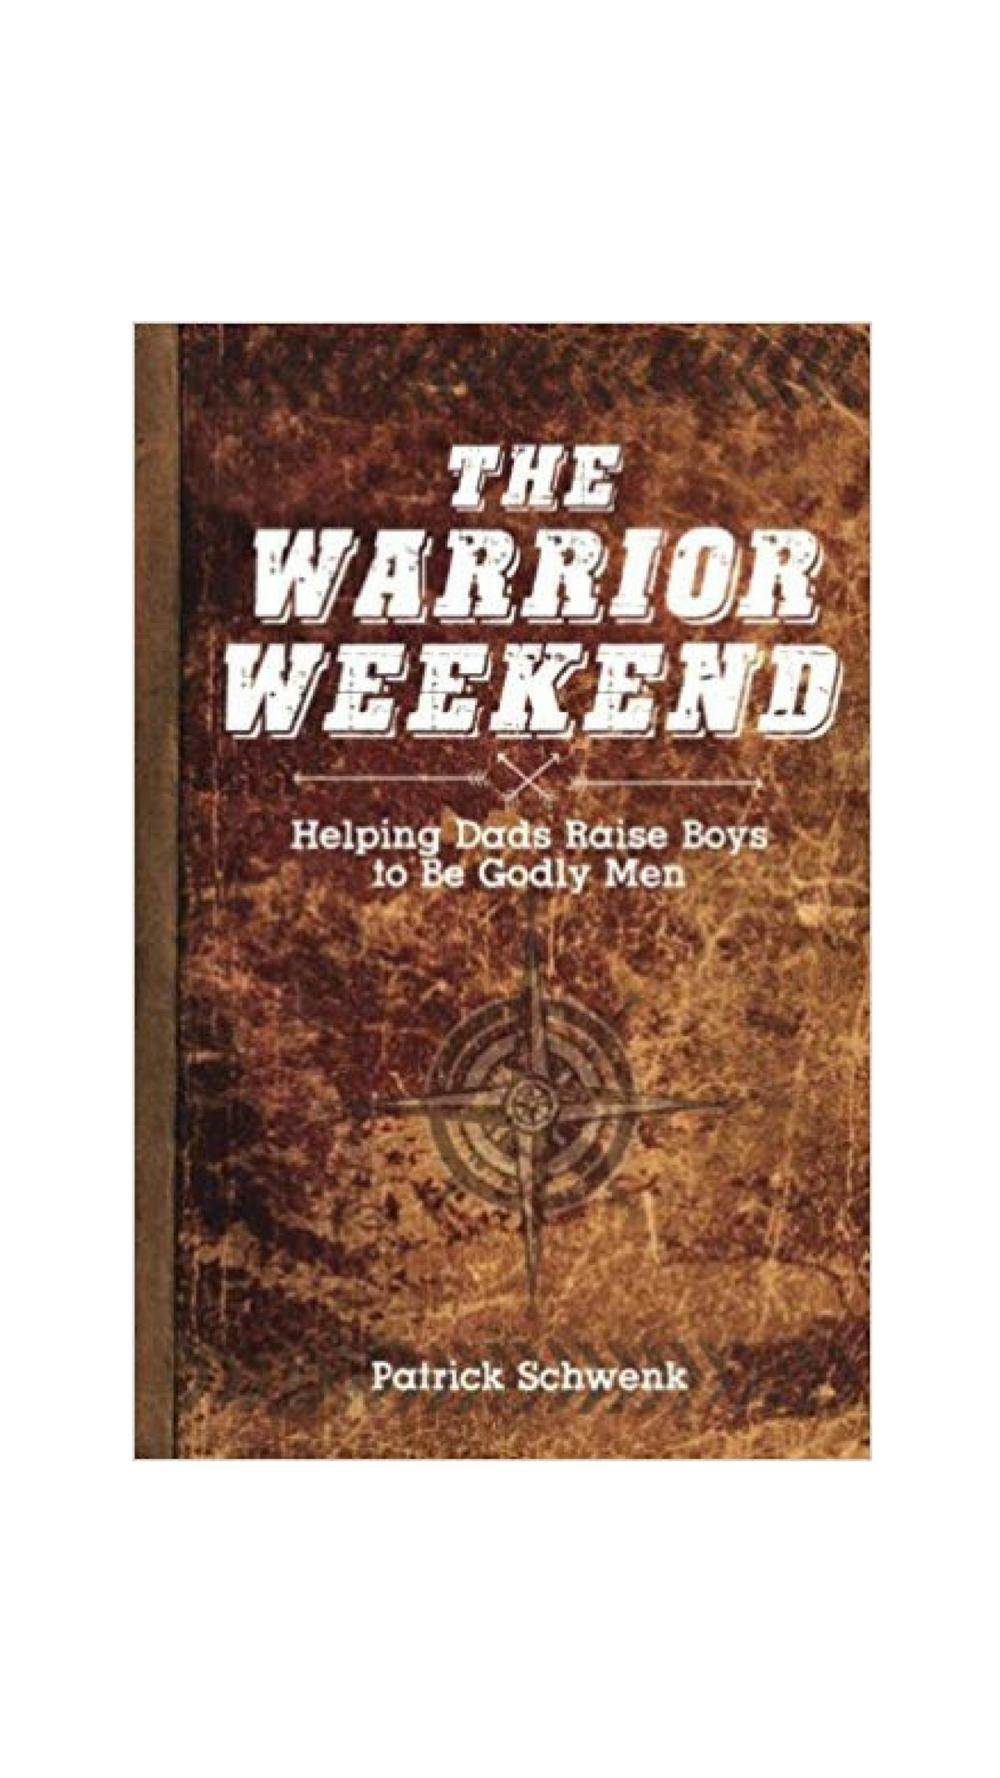 TBM-WarriorWeekend-IGstory.png